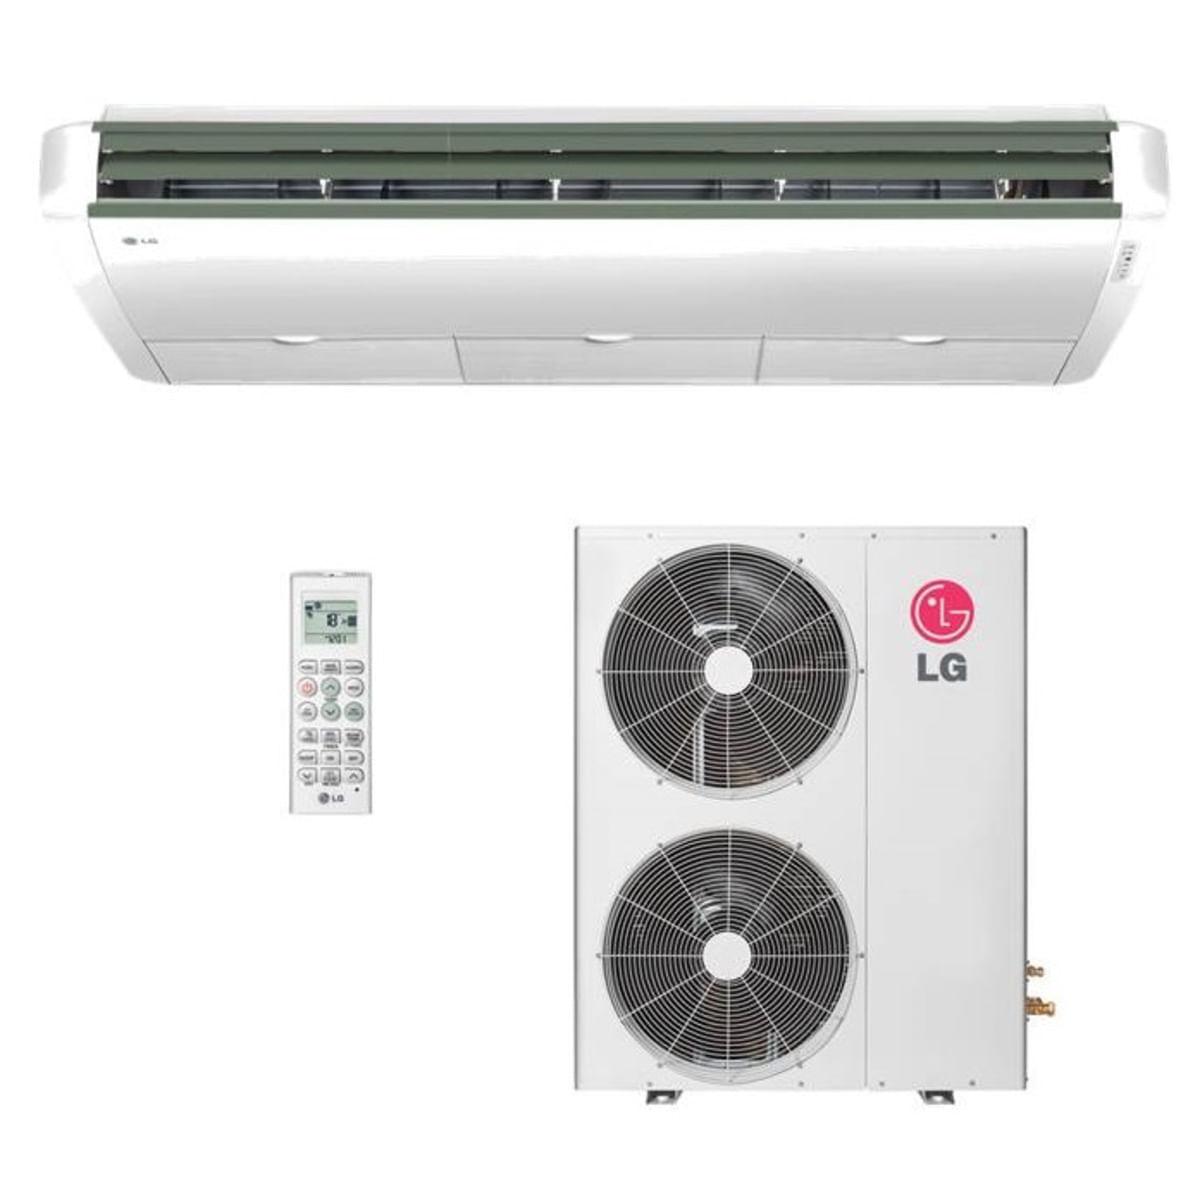 Ar-Condicionado-Split-LG-Teto-Convencional-36.000-BTU-h-Frio-LV-C362KLA0-Conjunto